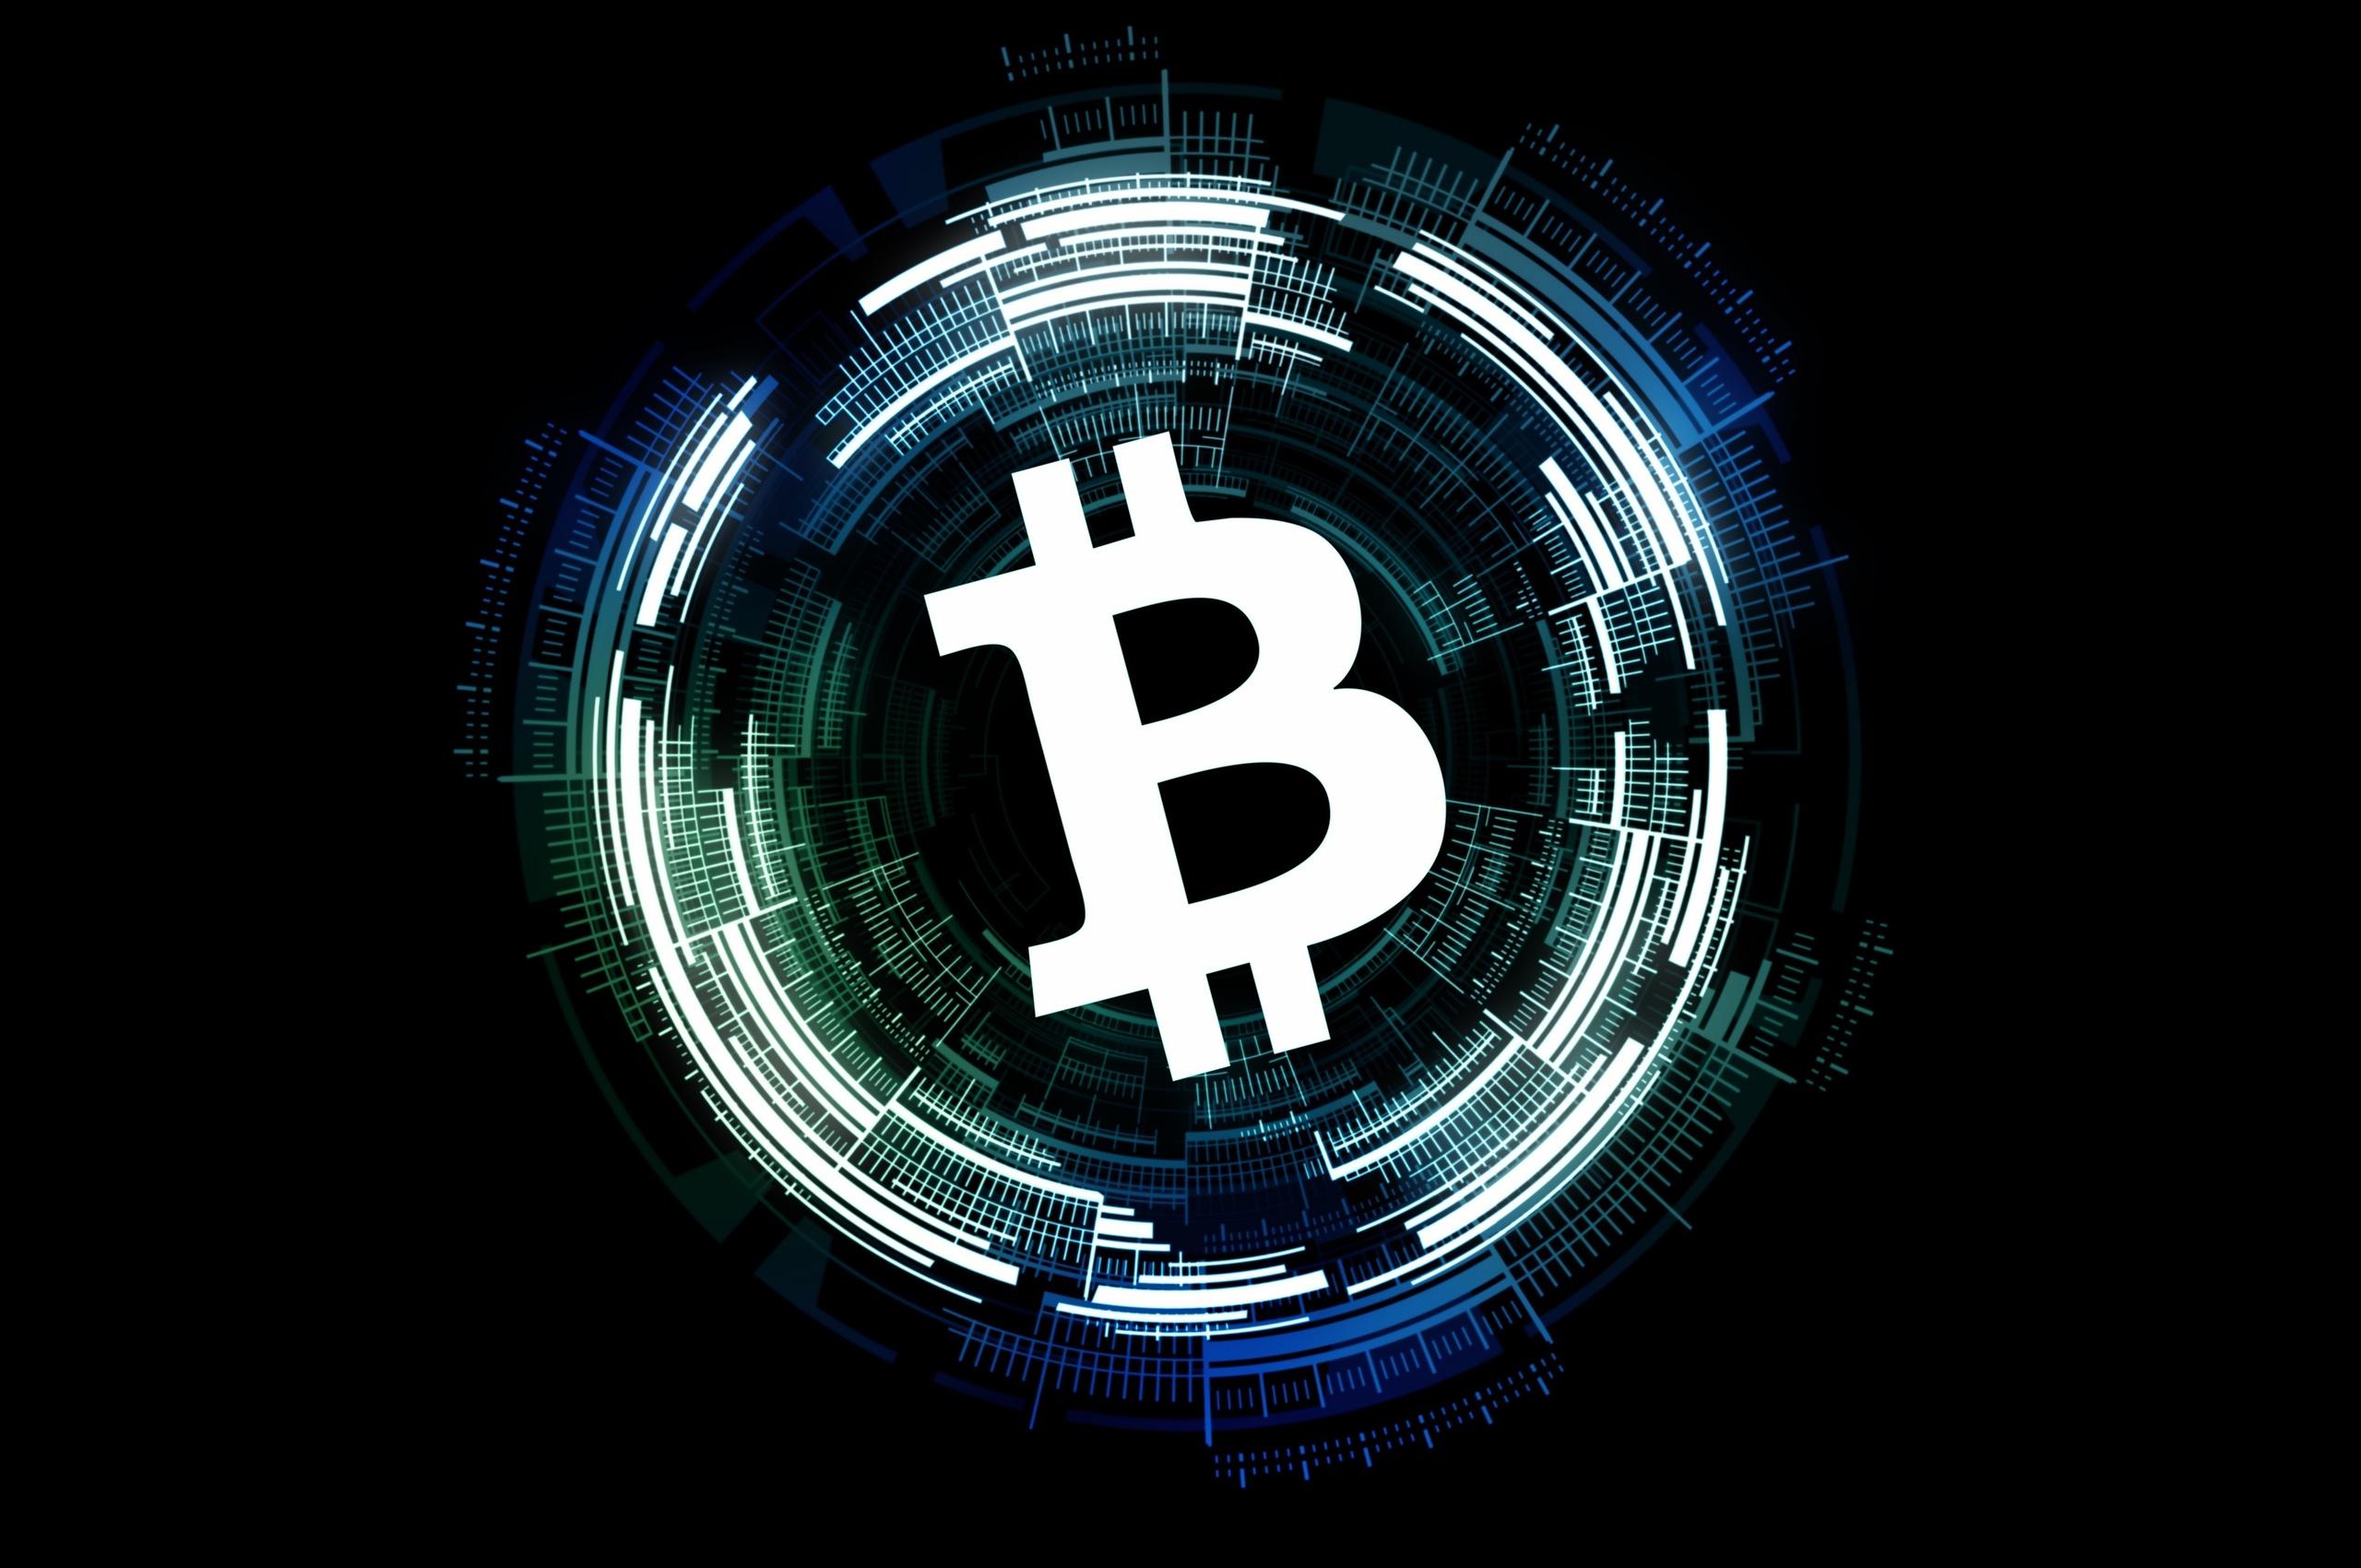 bitcoin-logo-black-background-4k-xe.jpg